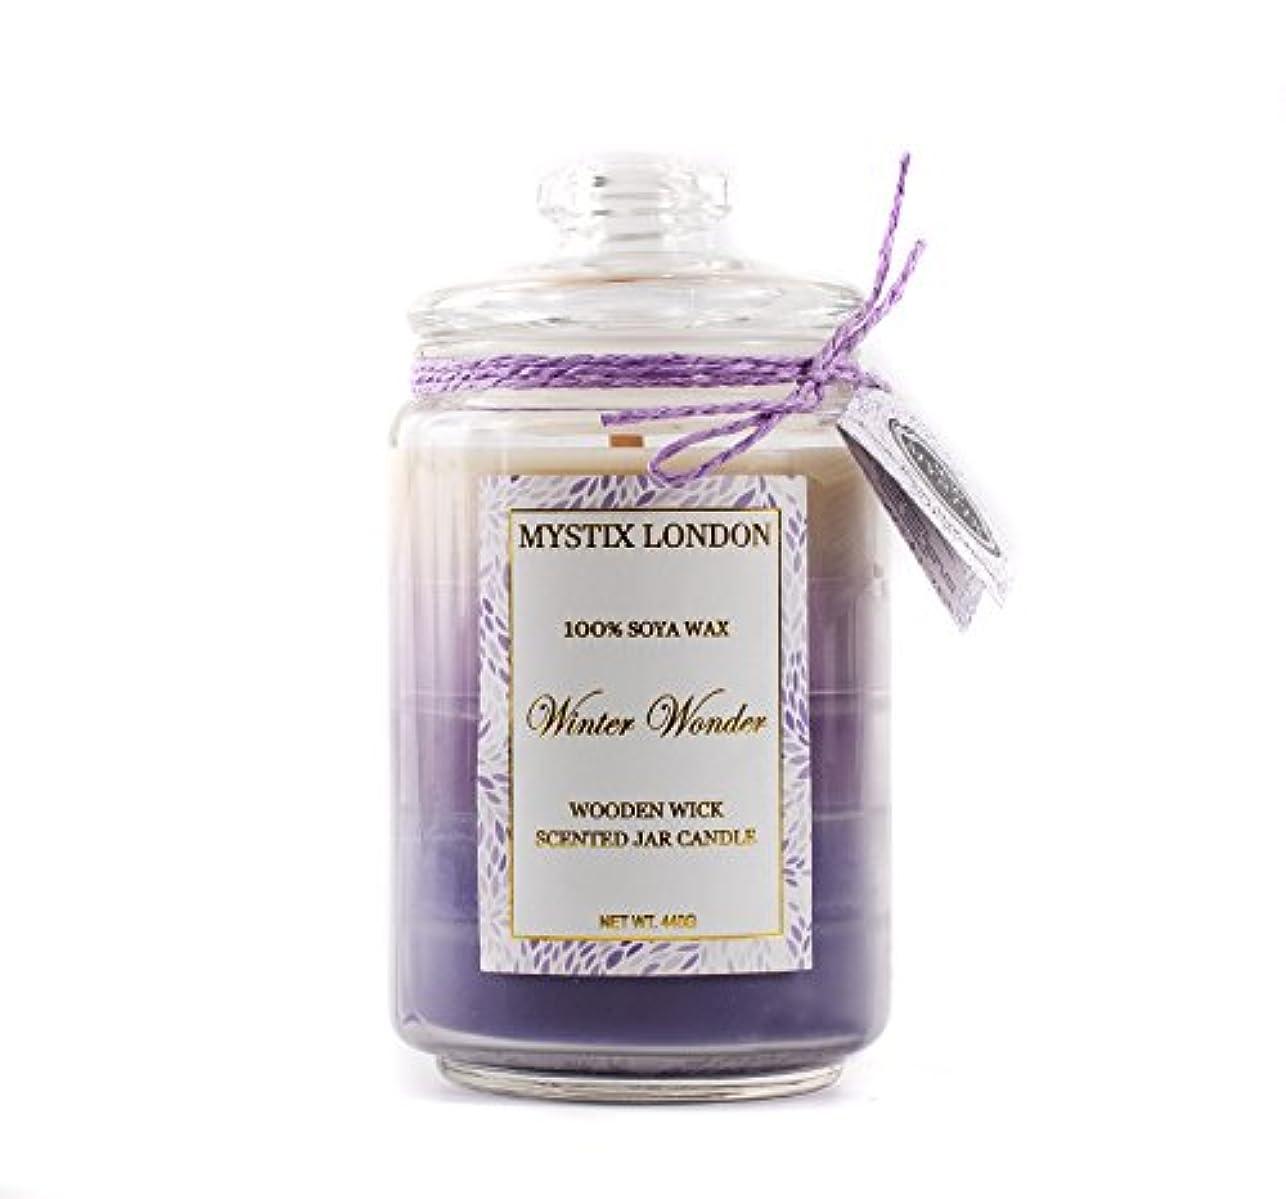 Mystix London   Winter Wonder Wooden Wick Scented Jar Candle 440g